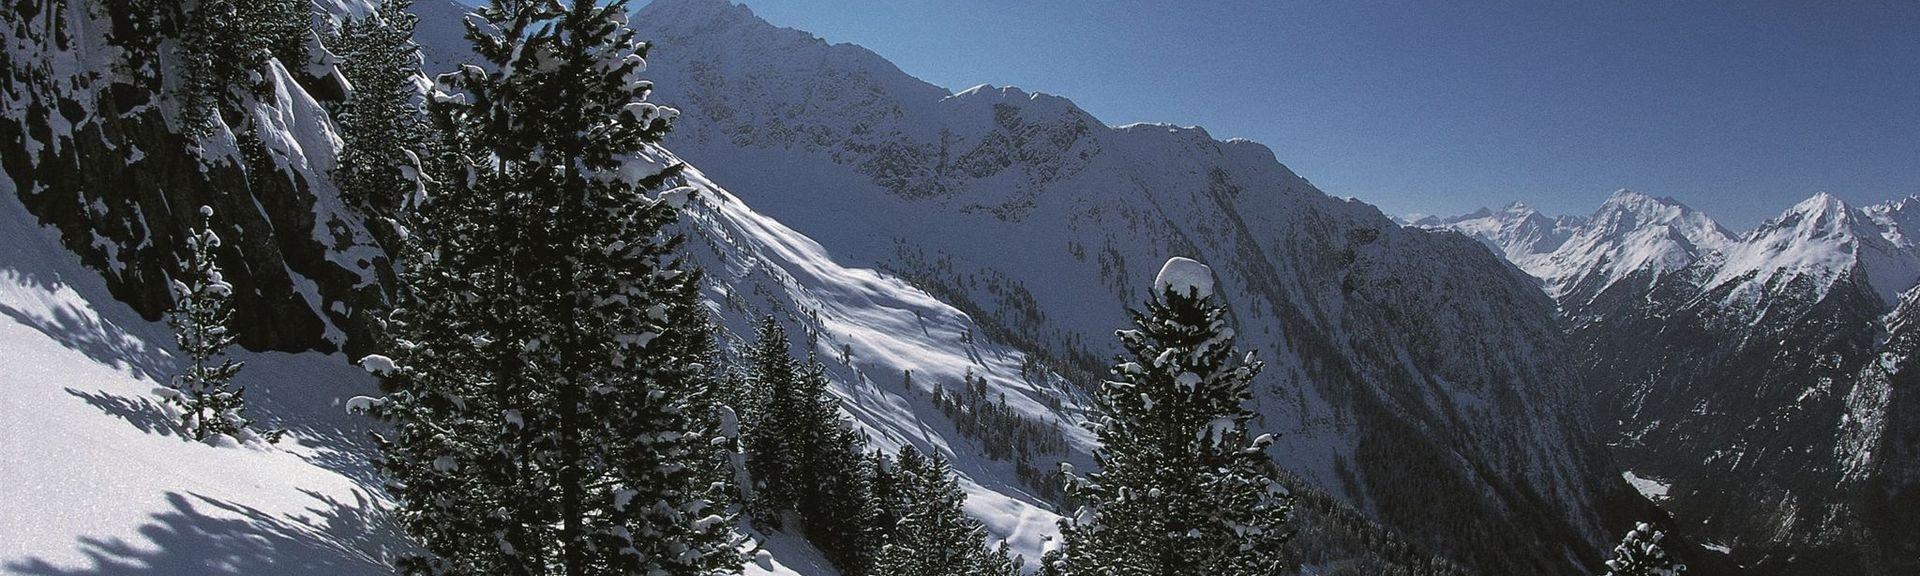 Oberau, Wildschönau, Tyrol, Austria